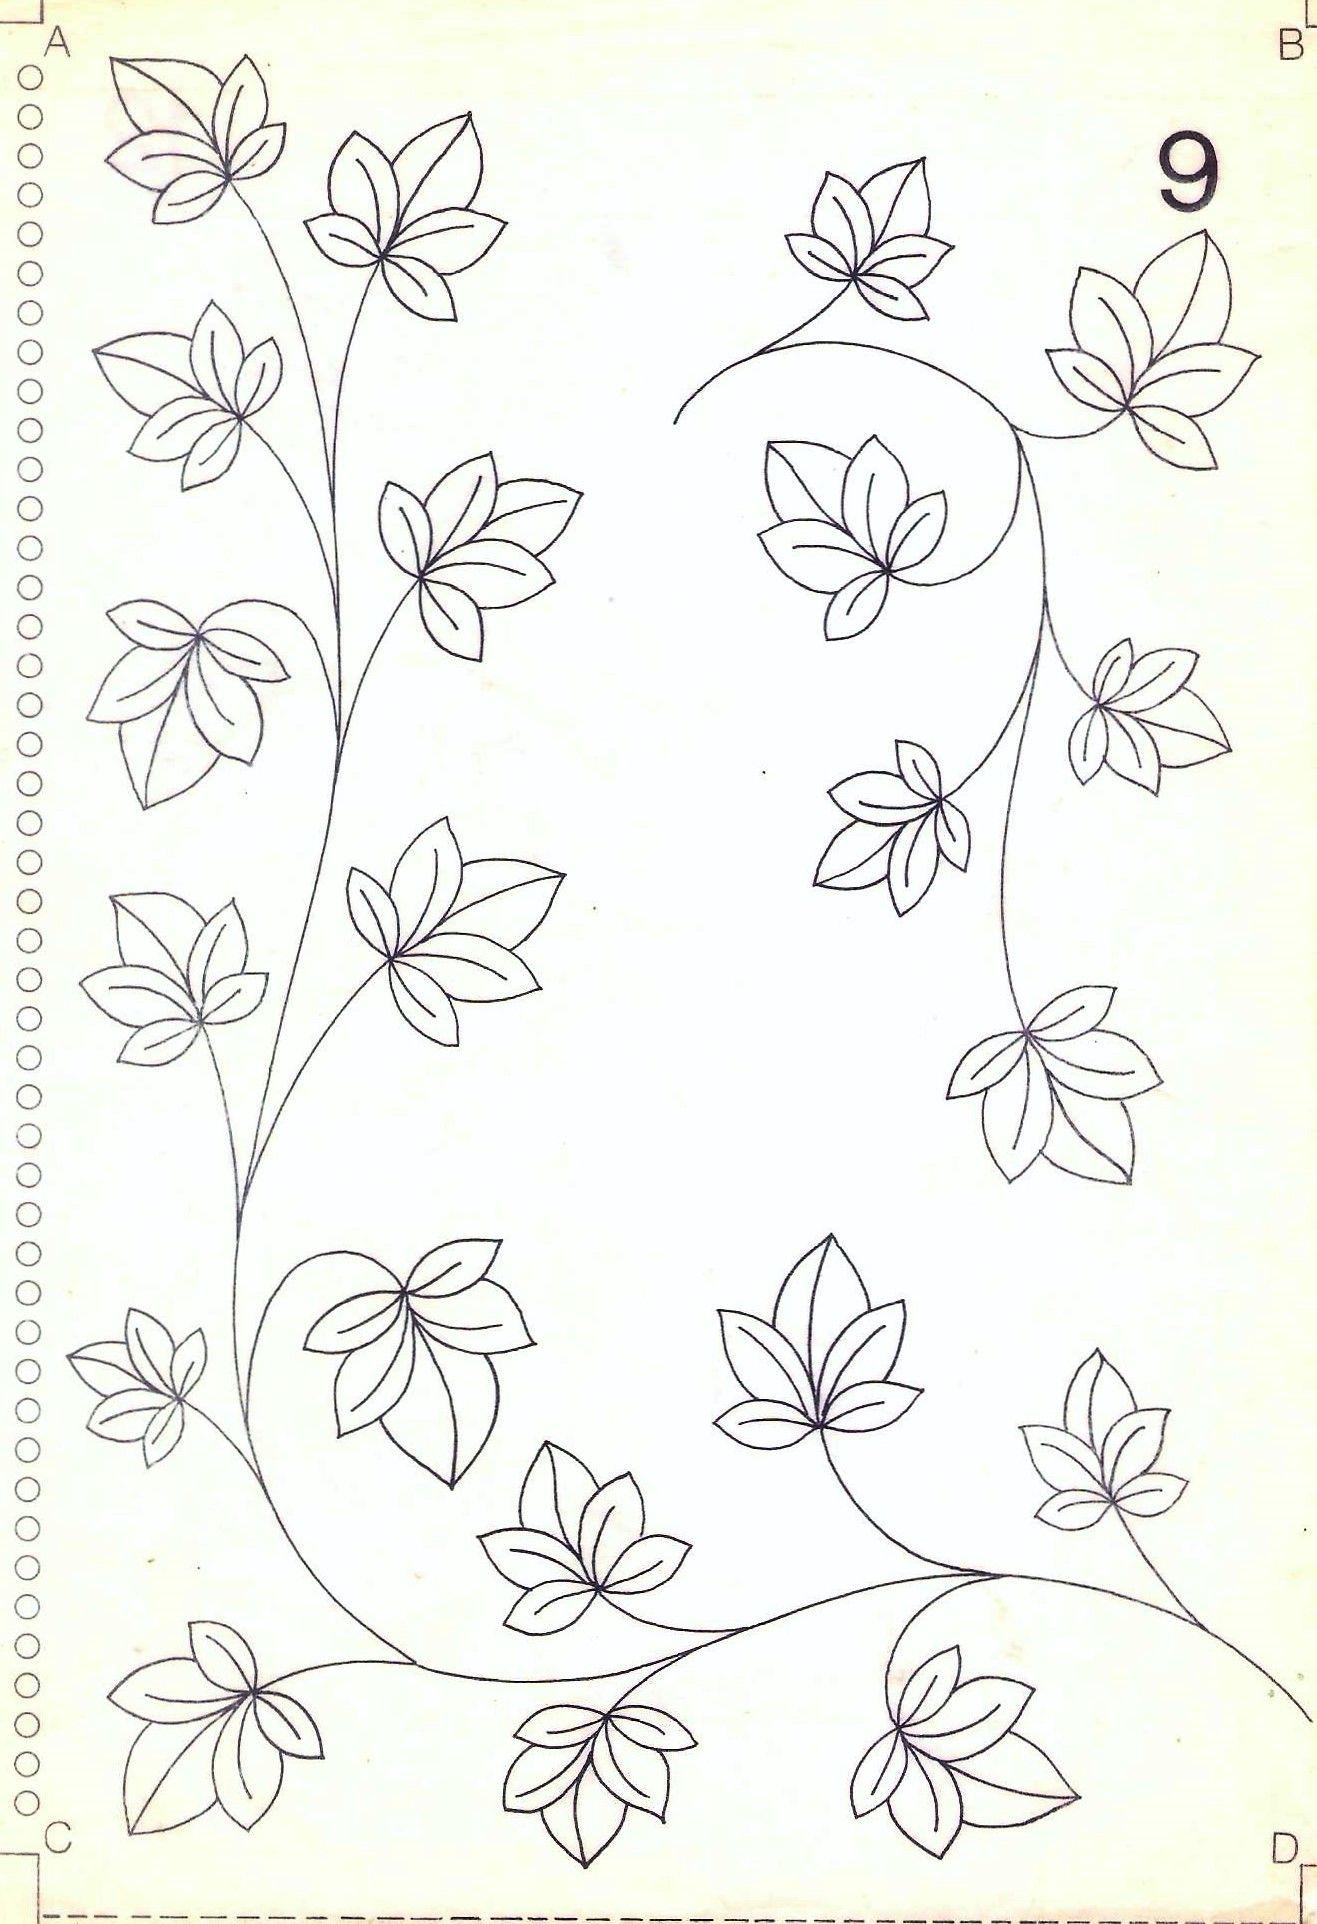 Yogurtcu | Embroidery | Pinterest | Bordado, Bordado a mano and Dibujos